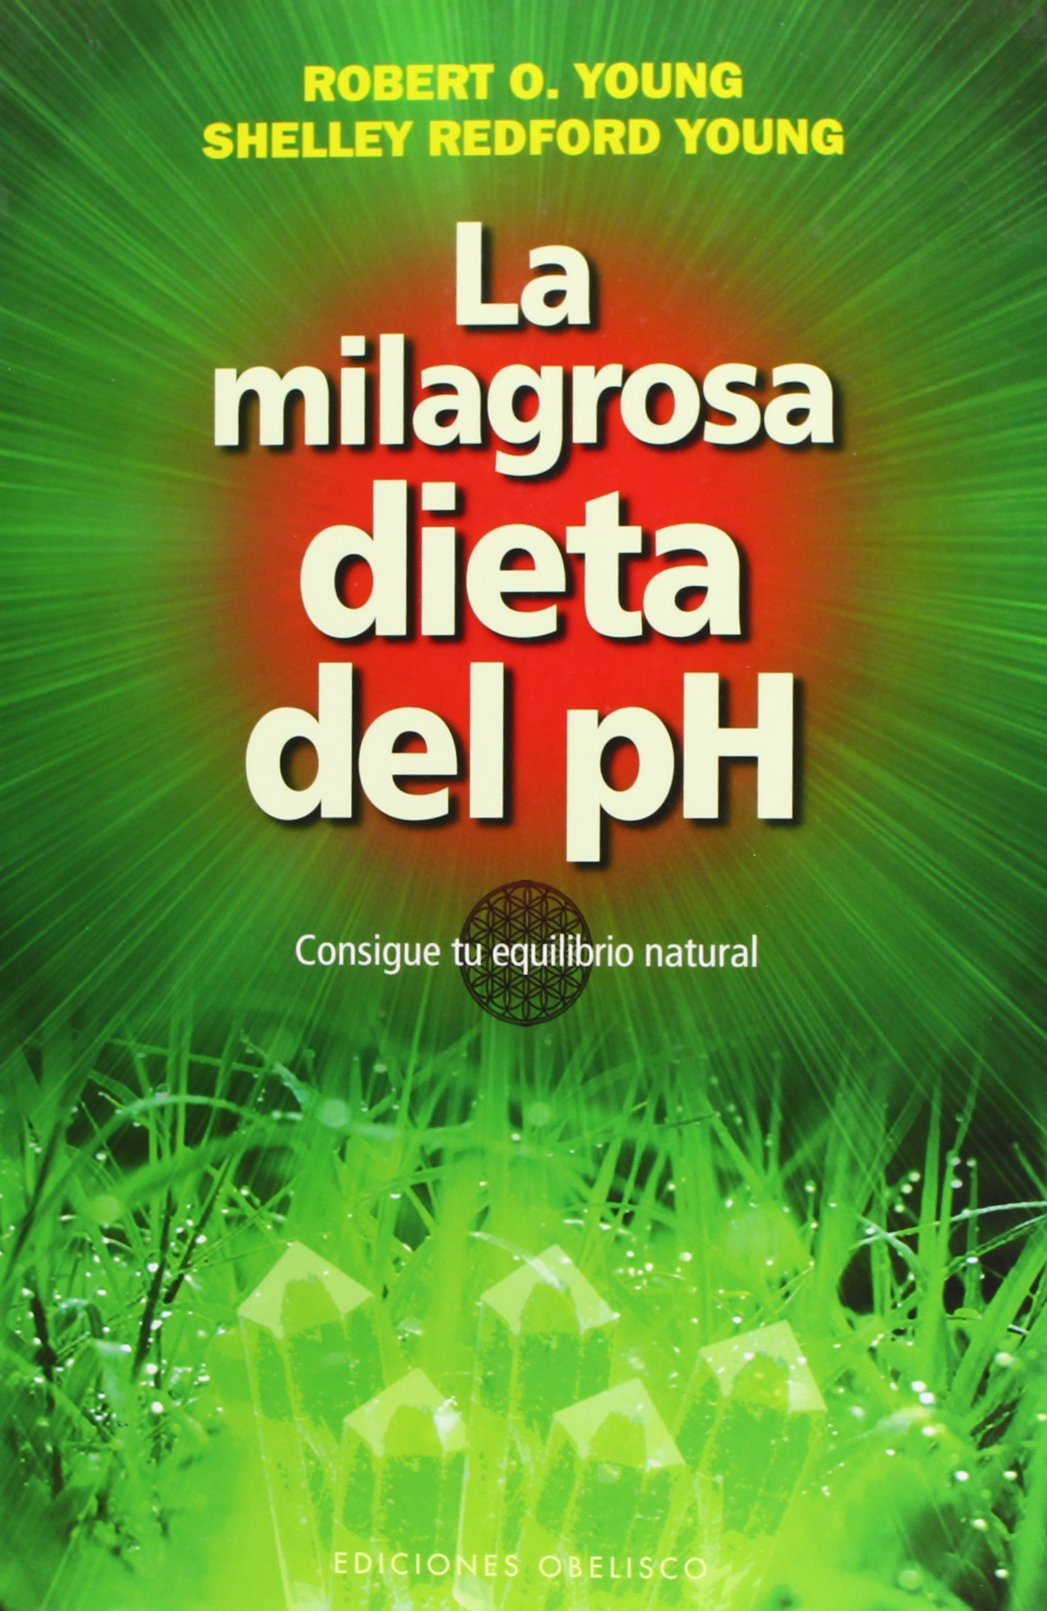 Dieta del Ph